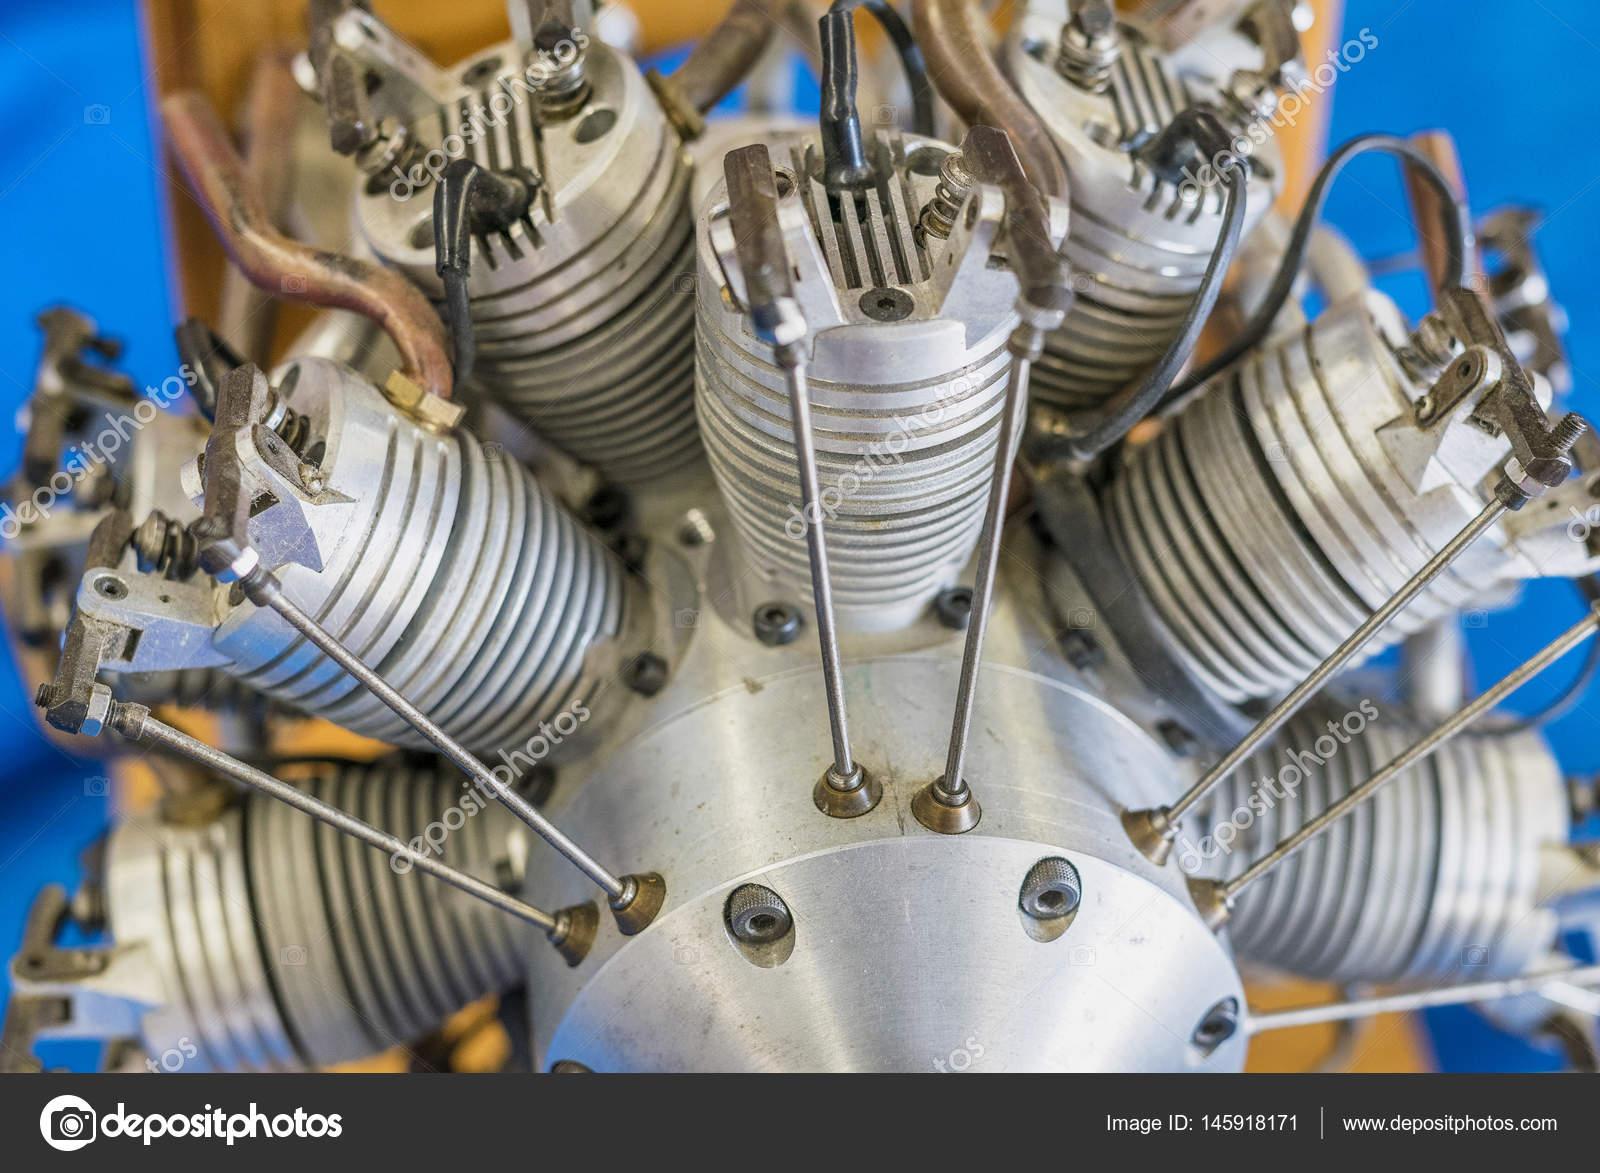 Elektronik-Komponenten für Drohnen motor — Stockfoto © jovannig ...